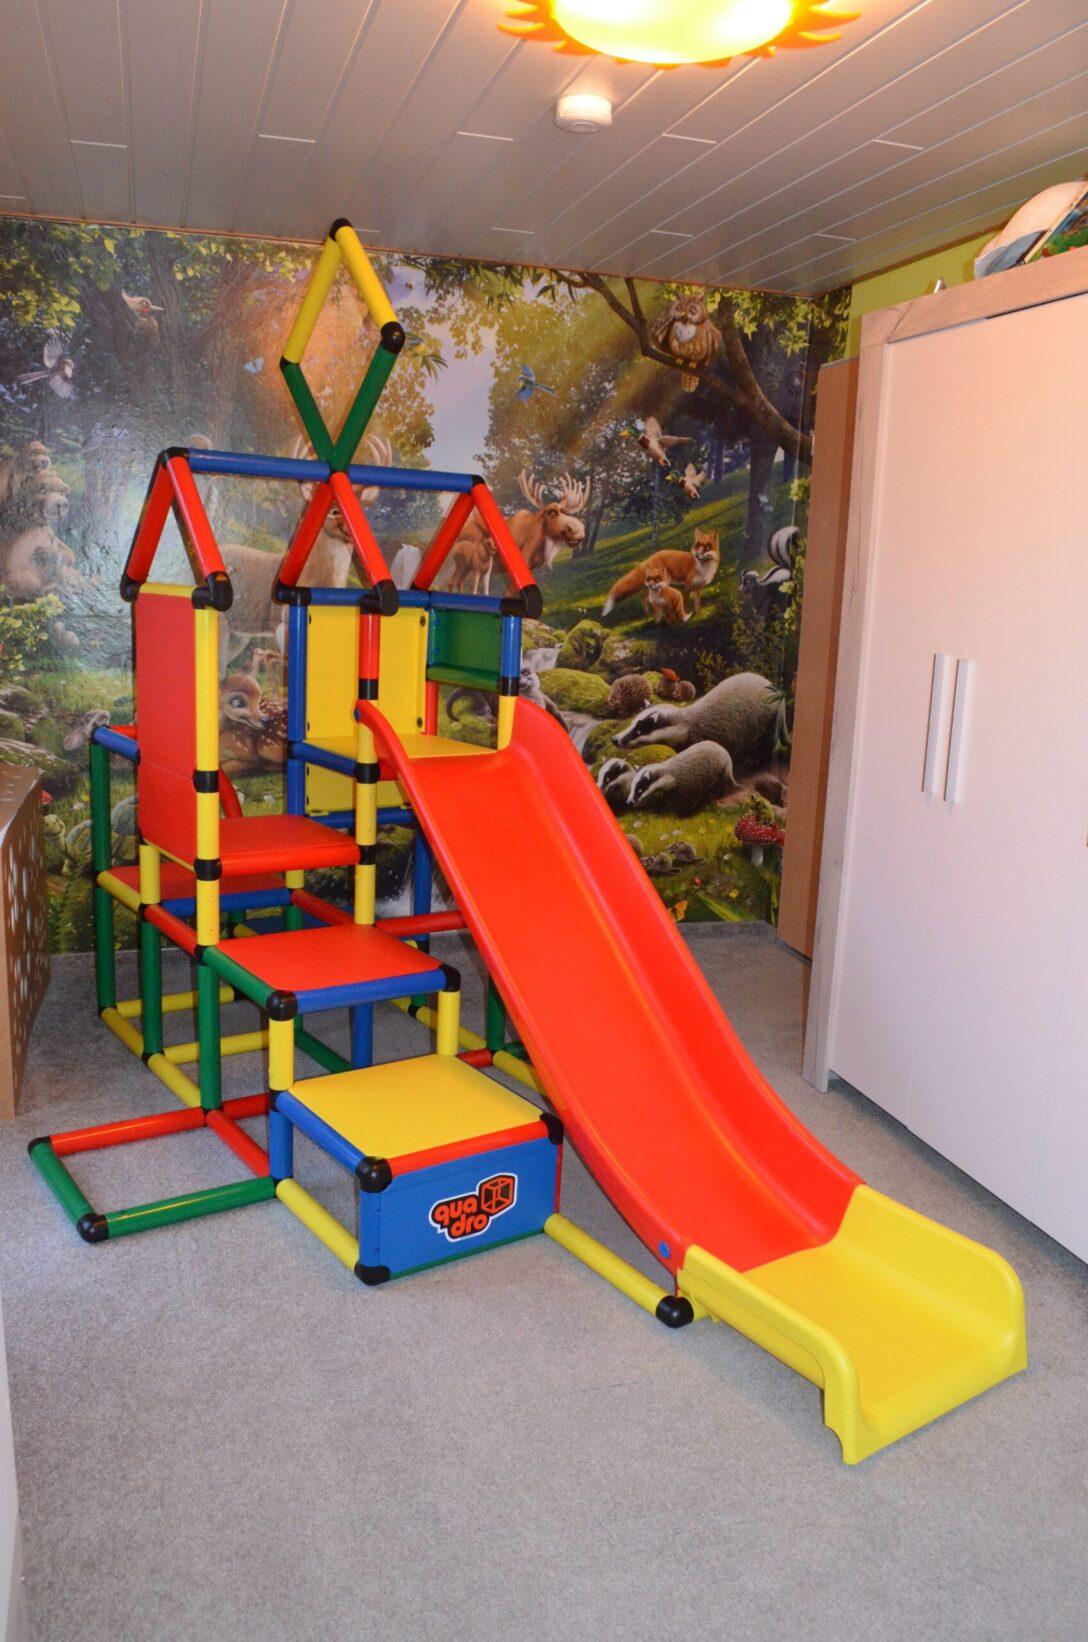 Large Size of Kidwood Klettergerüst Klettergerst Kinderzimmer Rakete Sport Set Garten Wohnzimmer Kidwood Klettergerüst